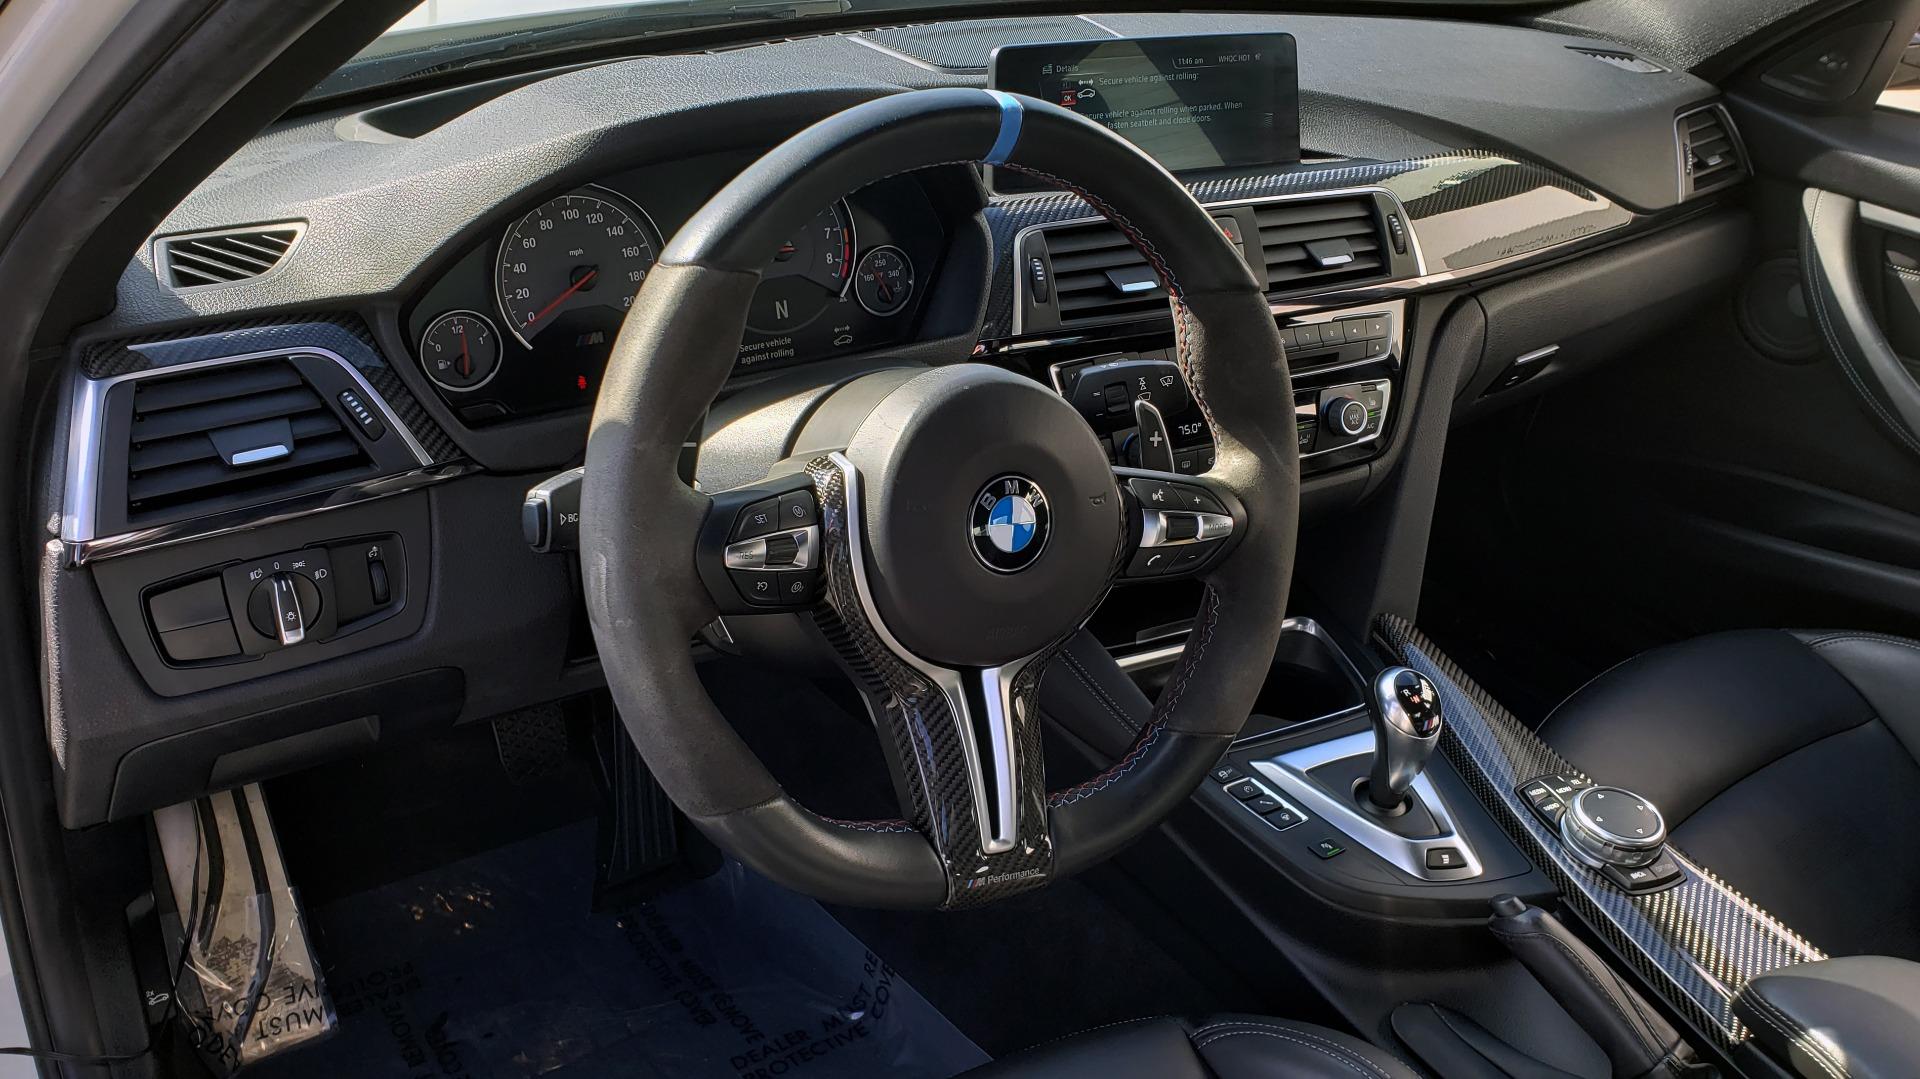 Used 2016 BMW M3 SEDAN / EXECUTIVE PKG / M-SUSPENSION / HARMAN/KARDON SOUND for sale Sold at Formula Imports in Charlotte NC 28227 43